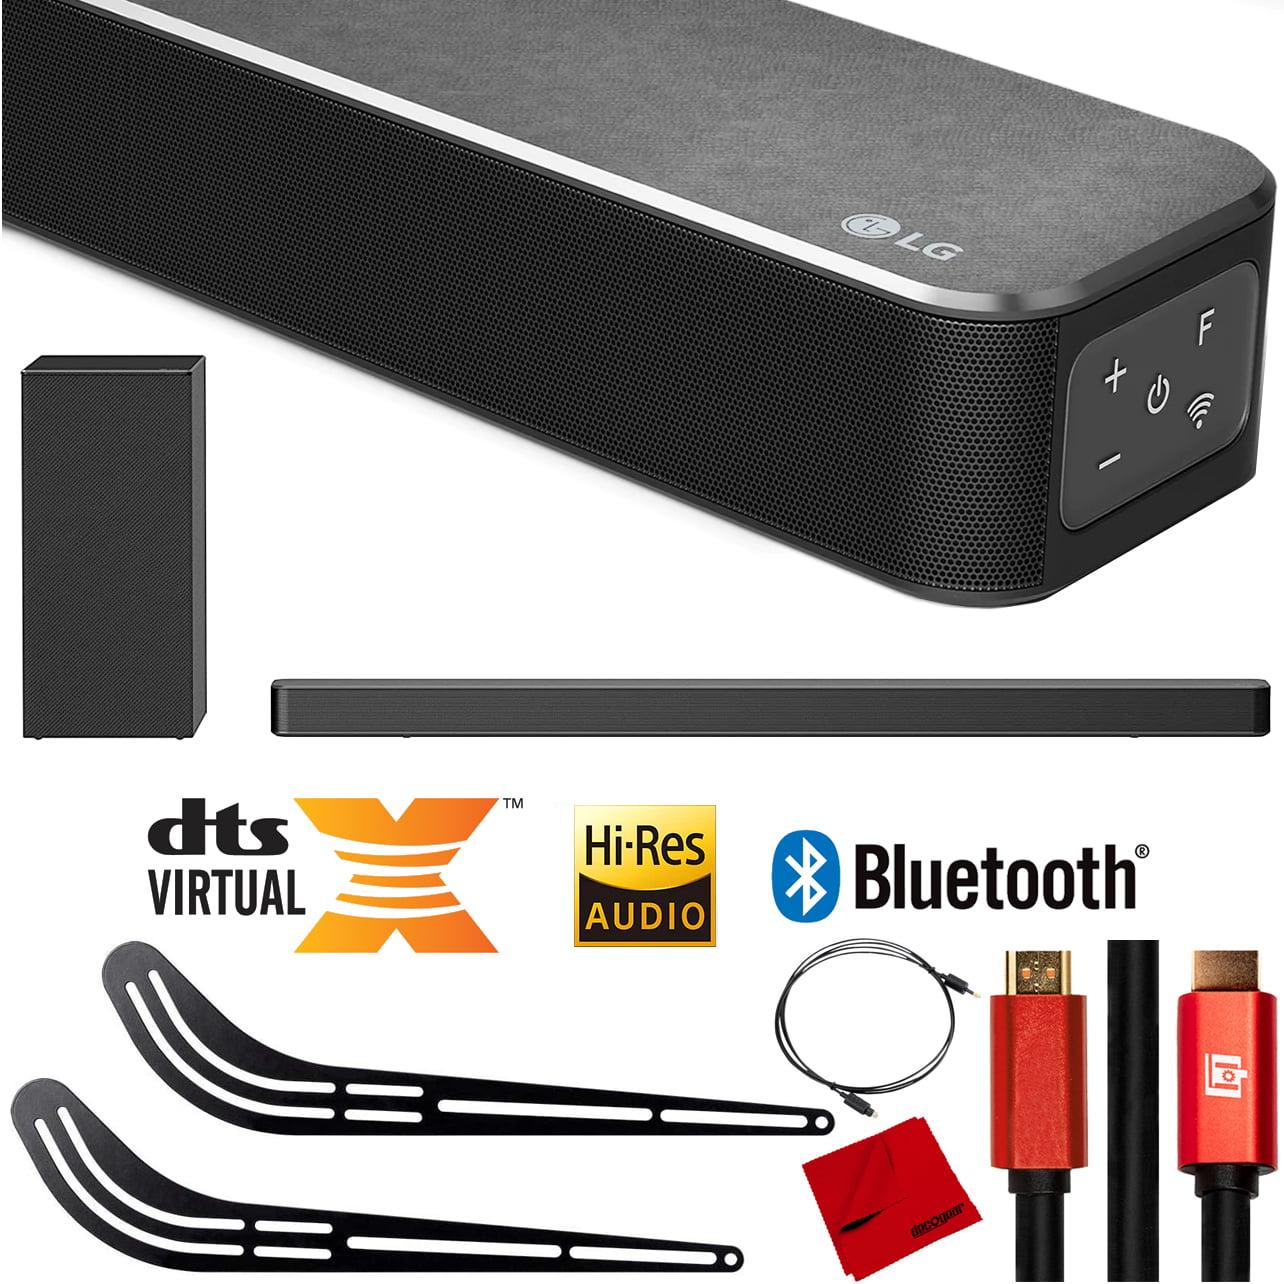 LG SN6Y 3.1 Ch High Res Audio Sound Bar With DTS Virtual:X